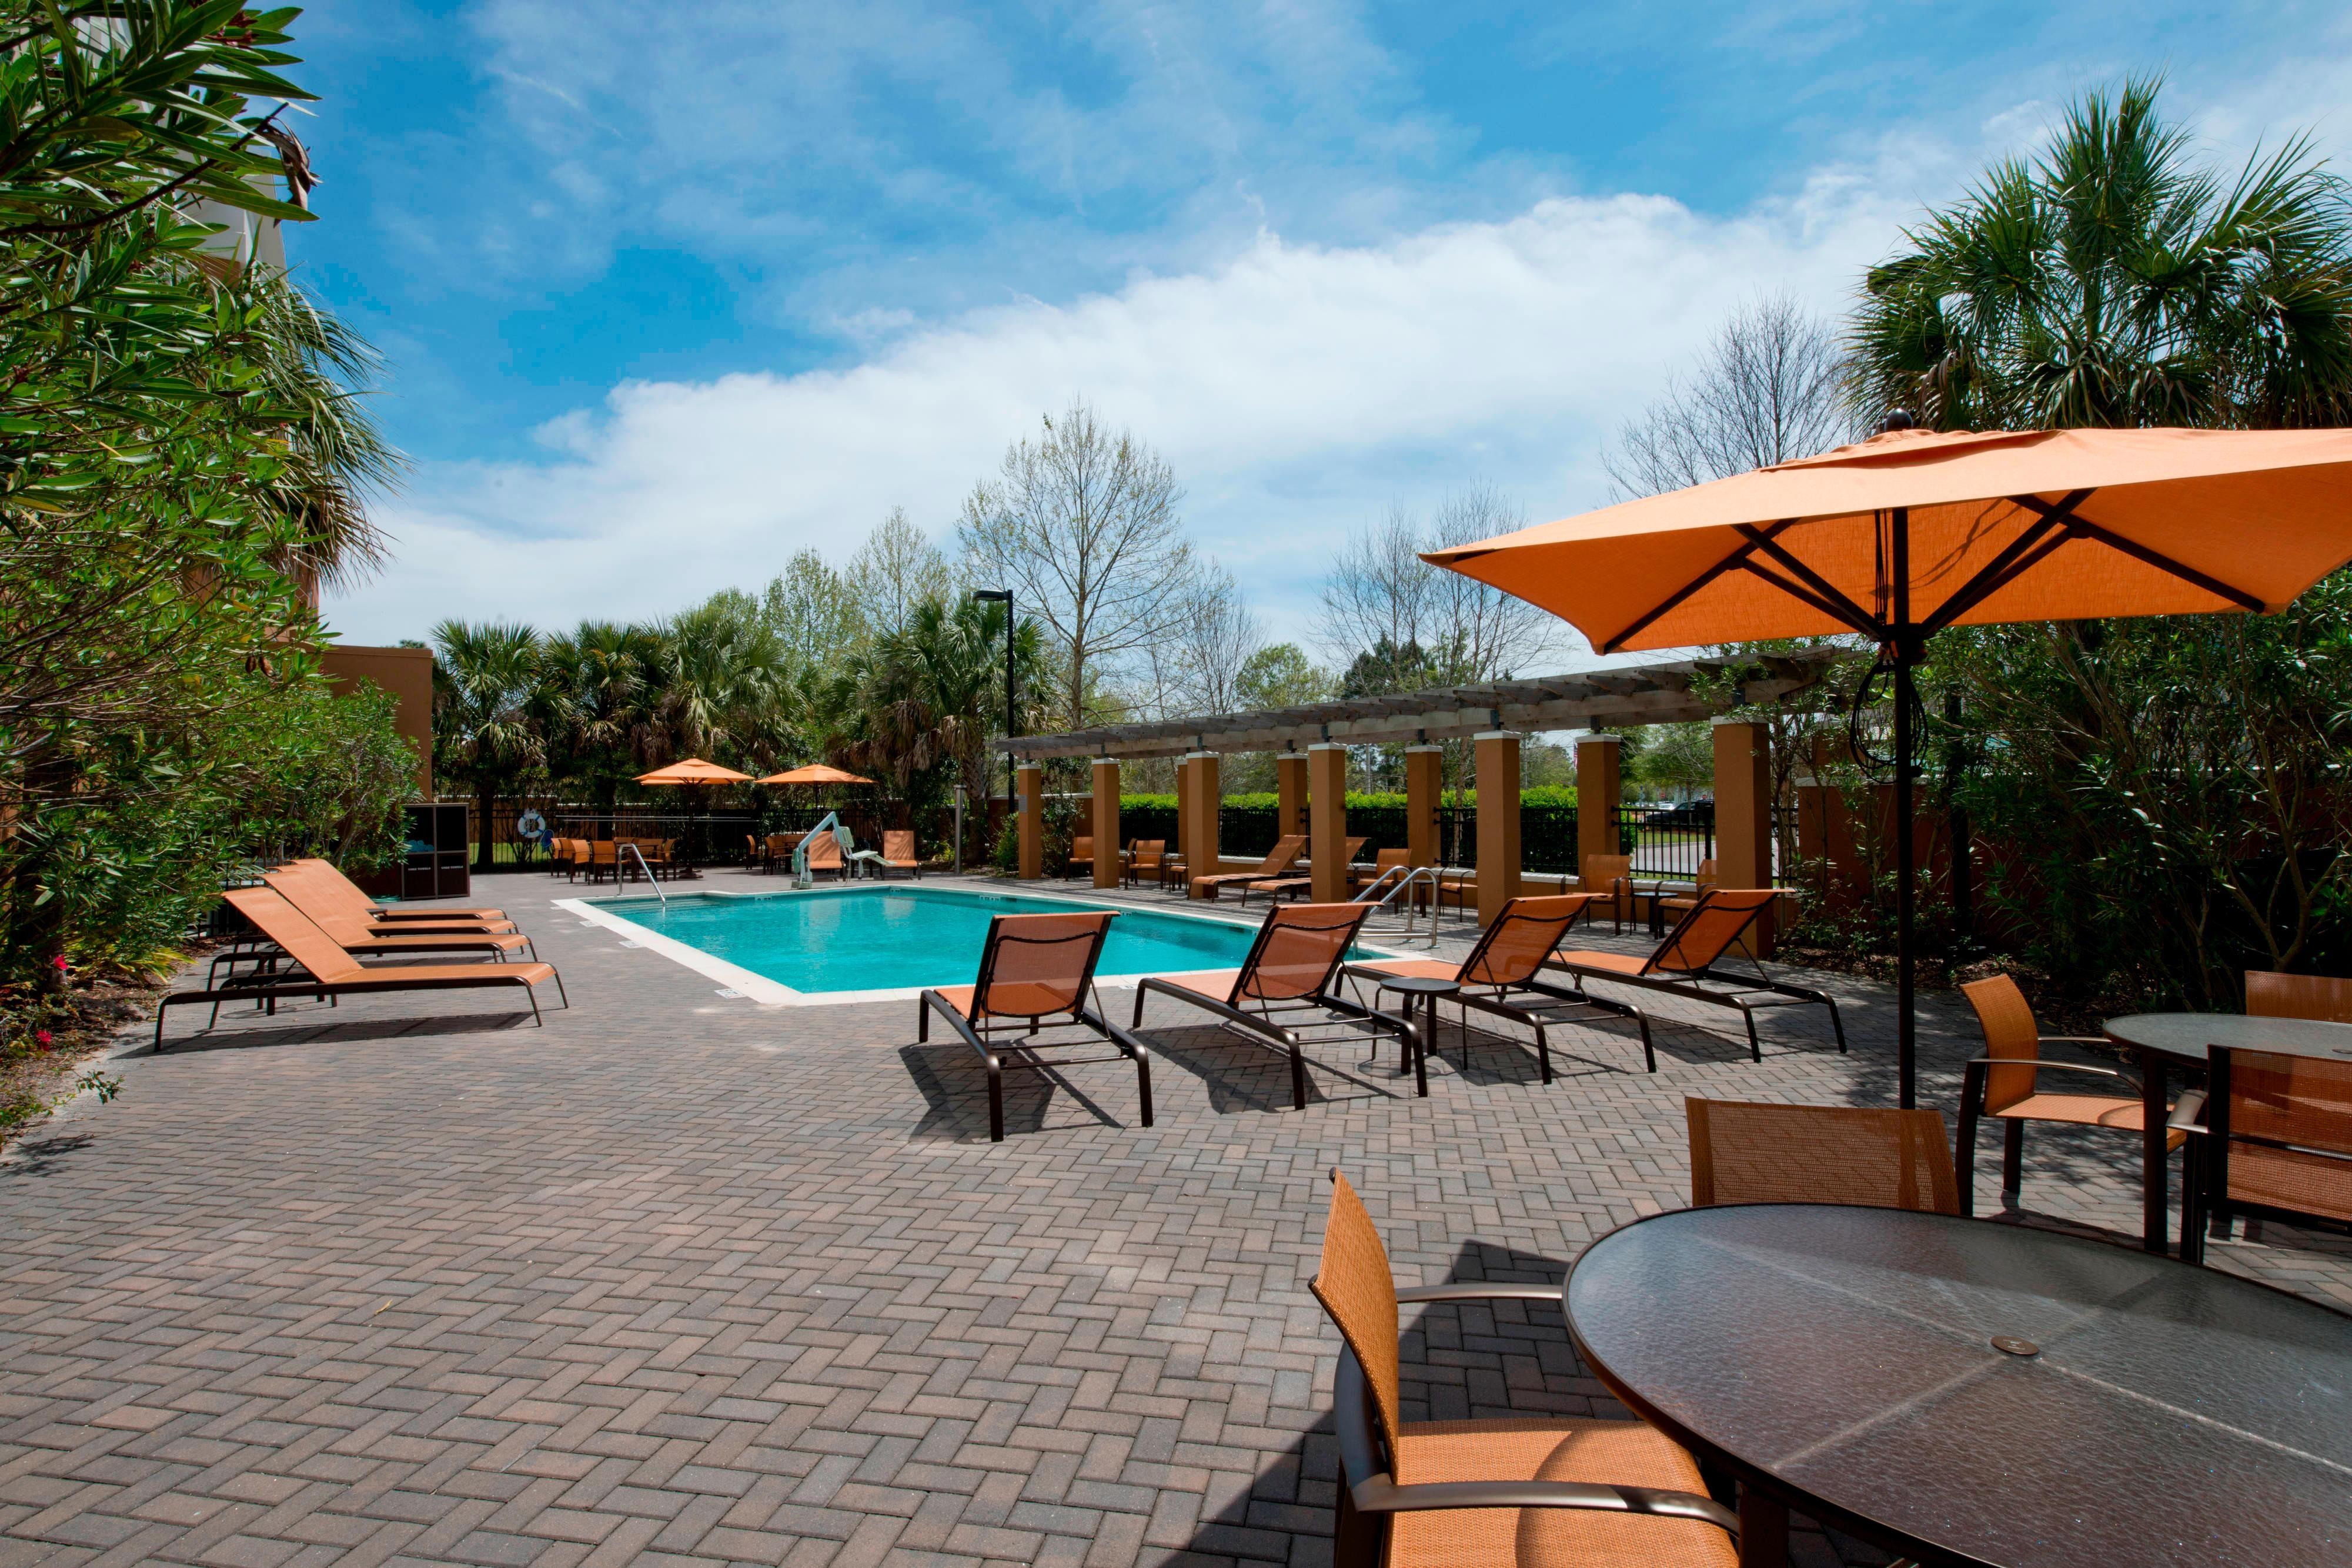 Jacksonville FL Courtyard by Marriott